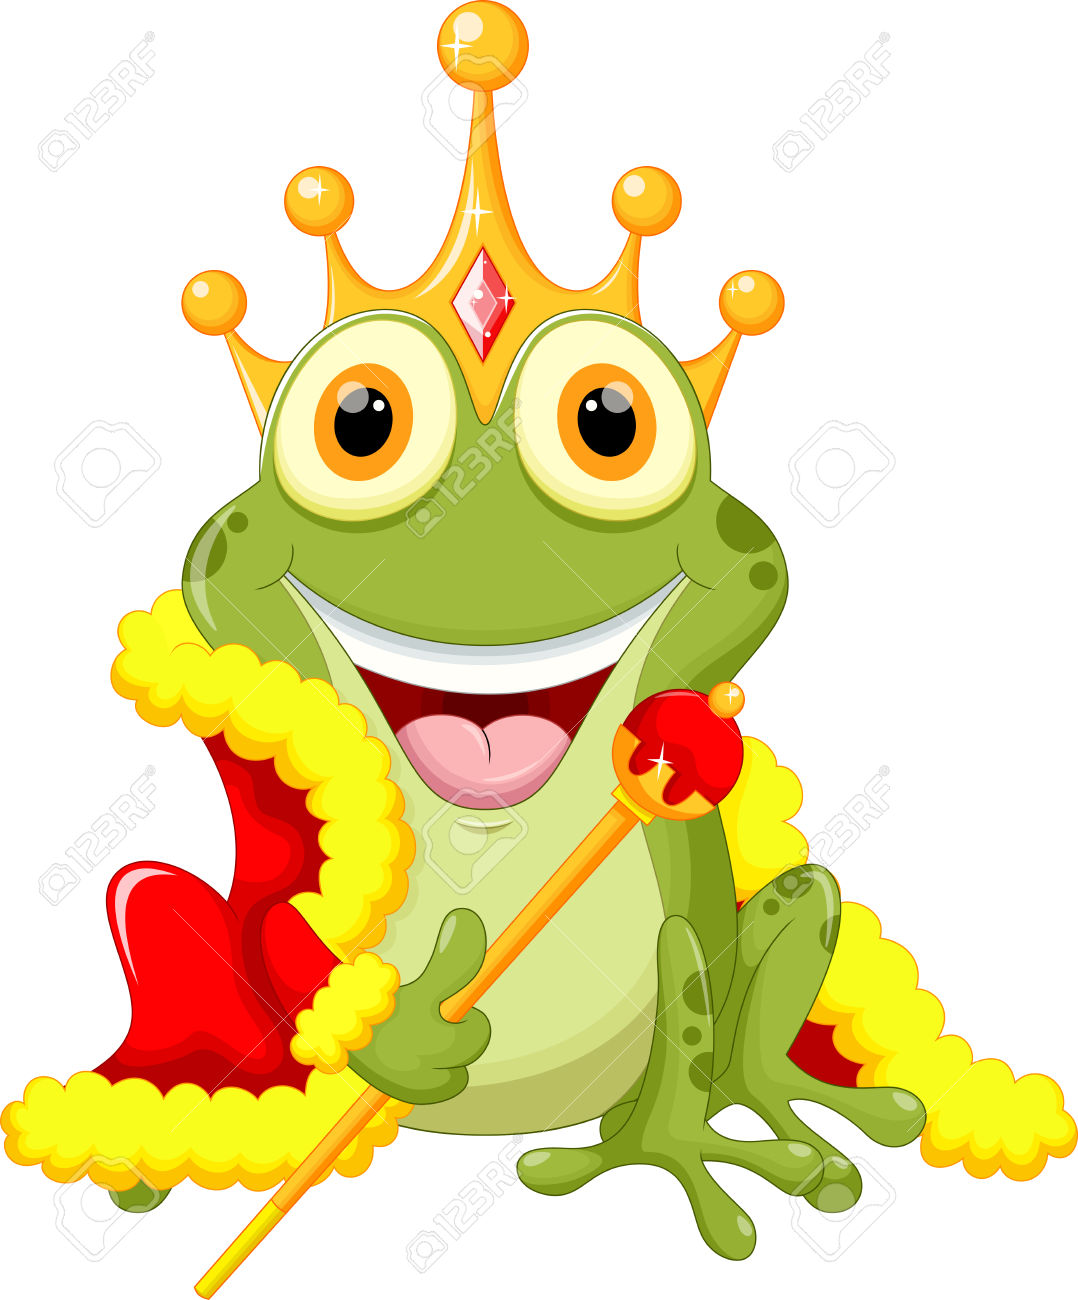 Cute Frog Prince Cartoon Royalty Free Cliparts, Vectors, And Stock.